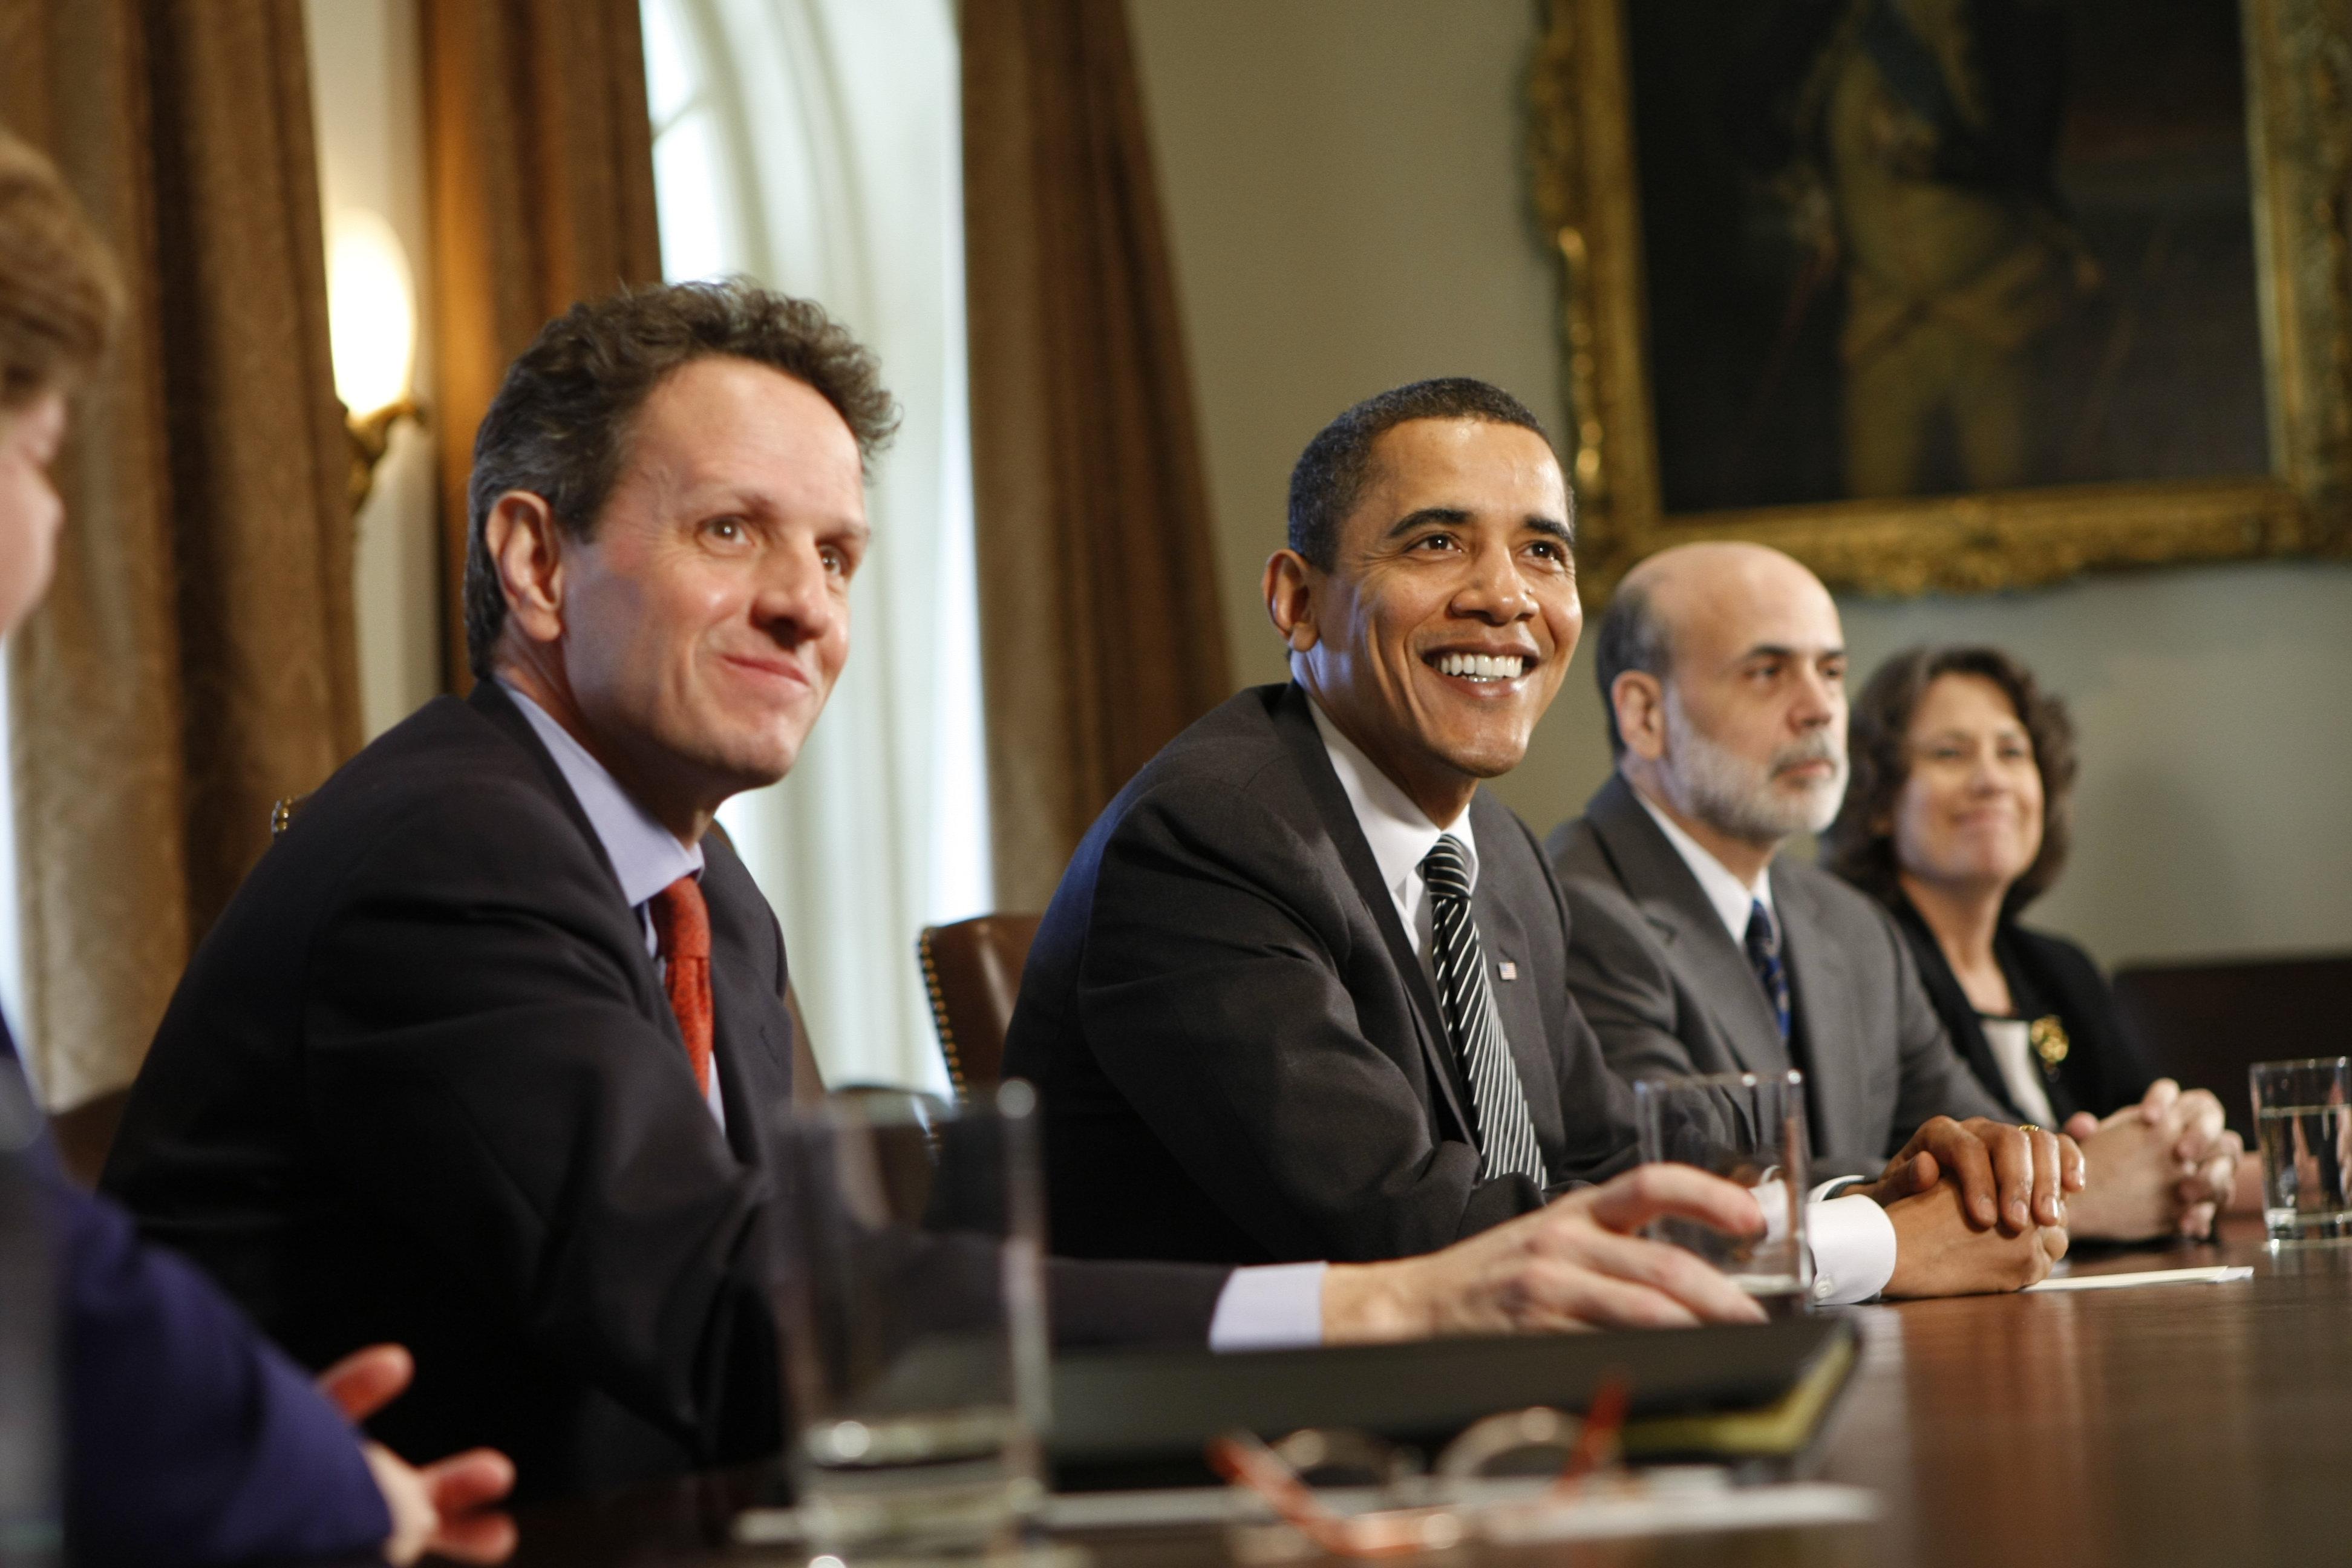 Barack Obama, Timothy Geithner, Ben Bernanke, Sheila Bair